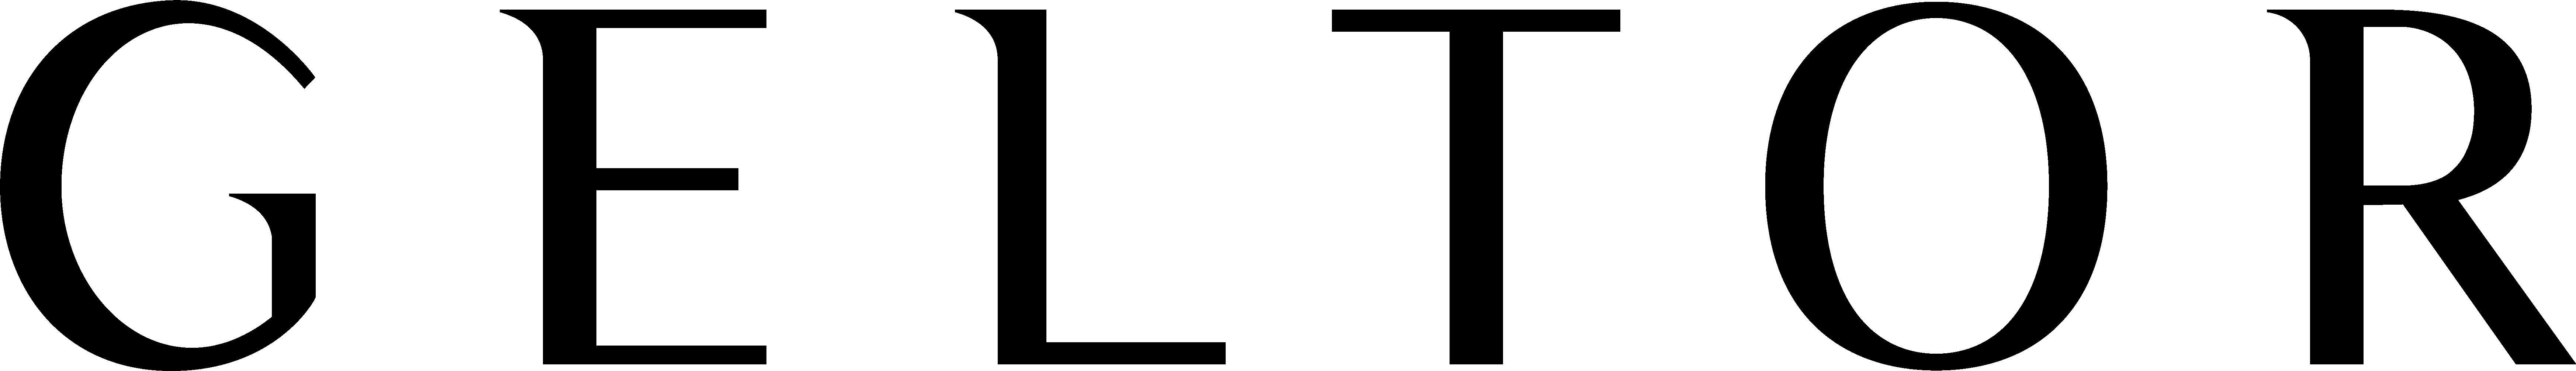 Geltor logo